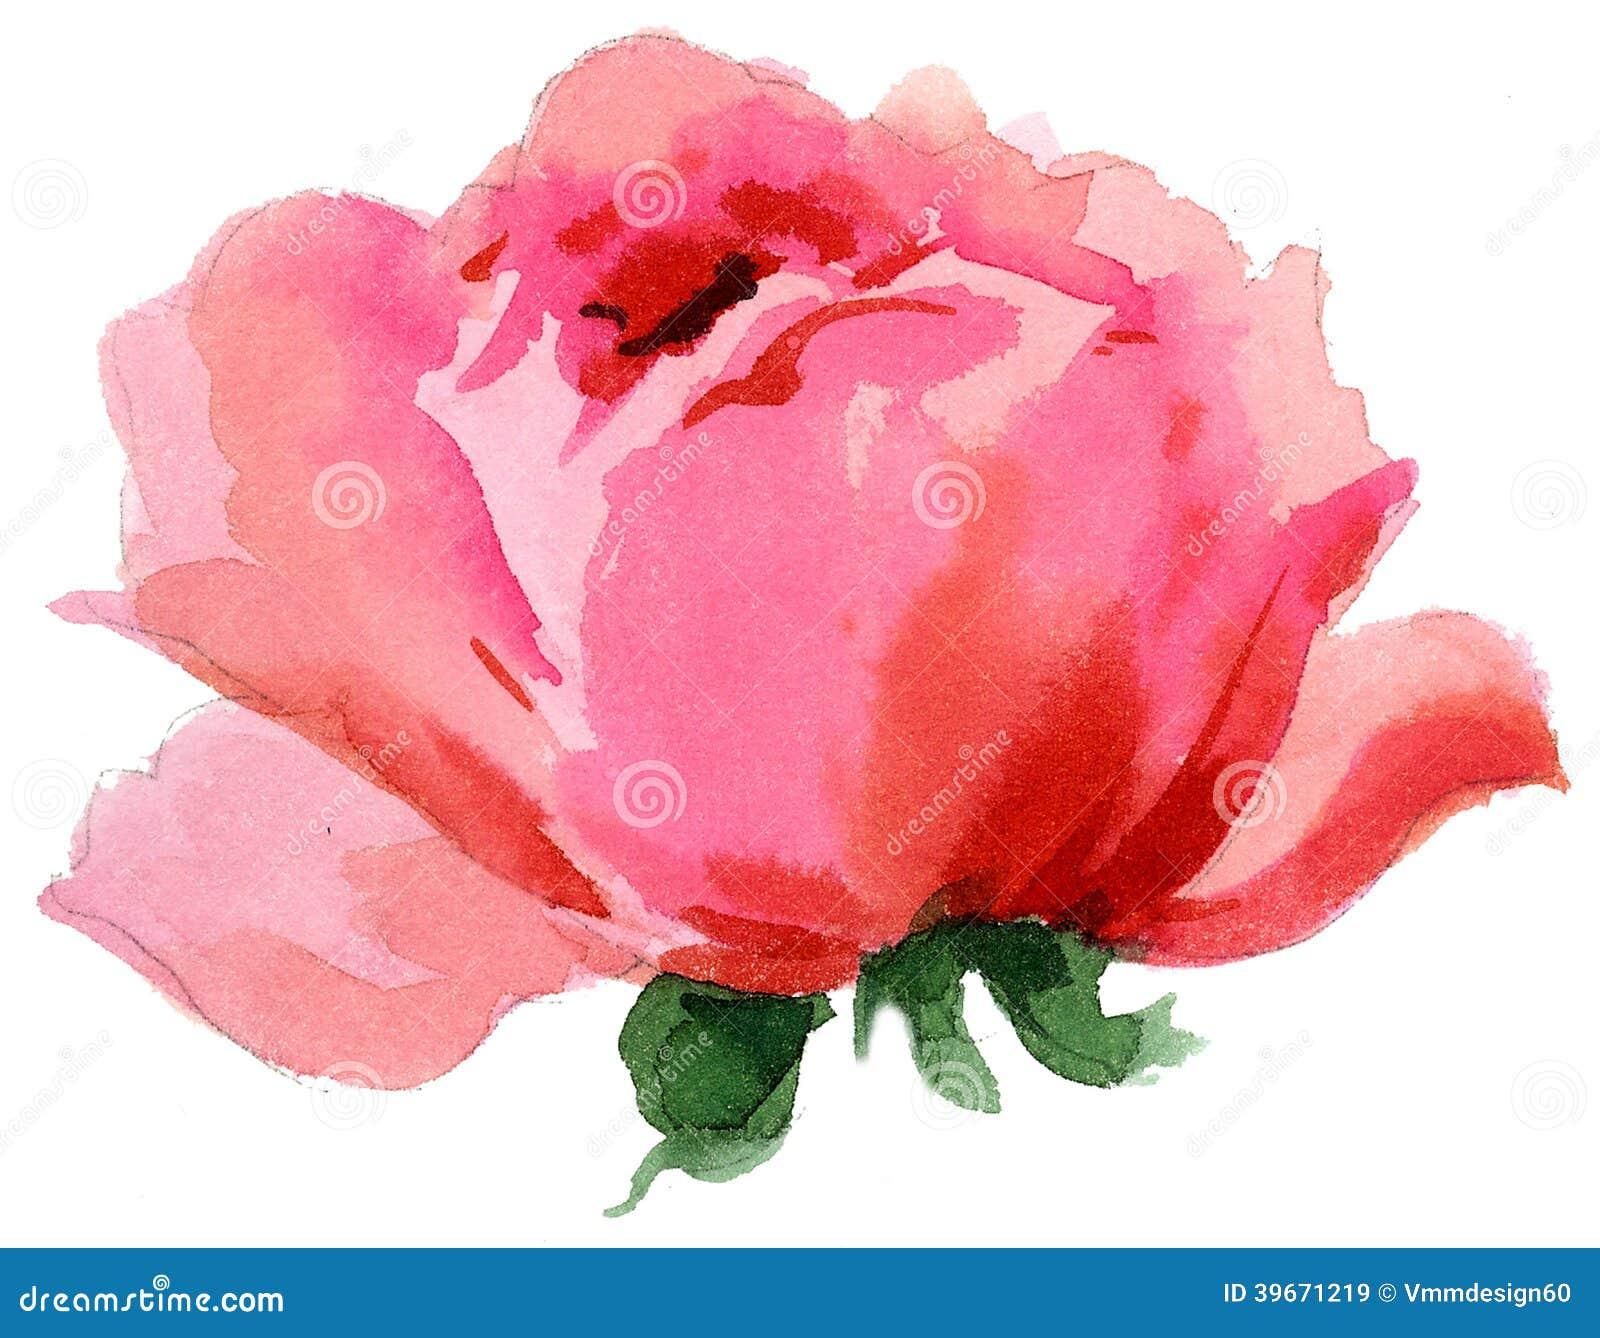 Watercolor Painting Beautiful Single Rose Stock Illustrations 574 Vectors Clipart